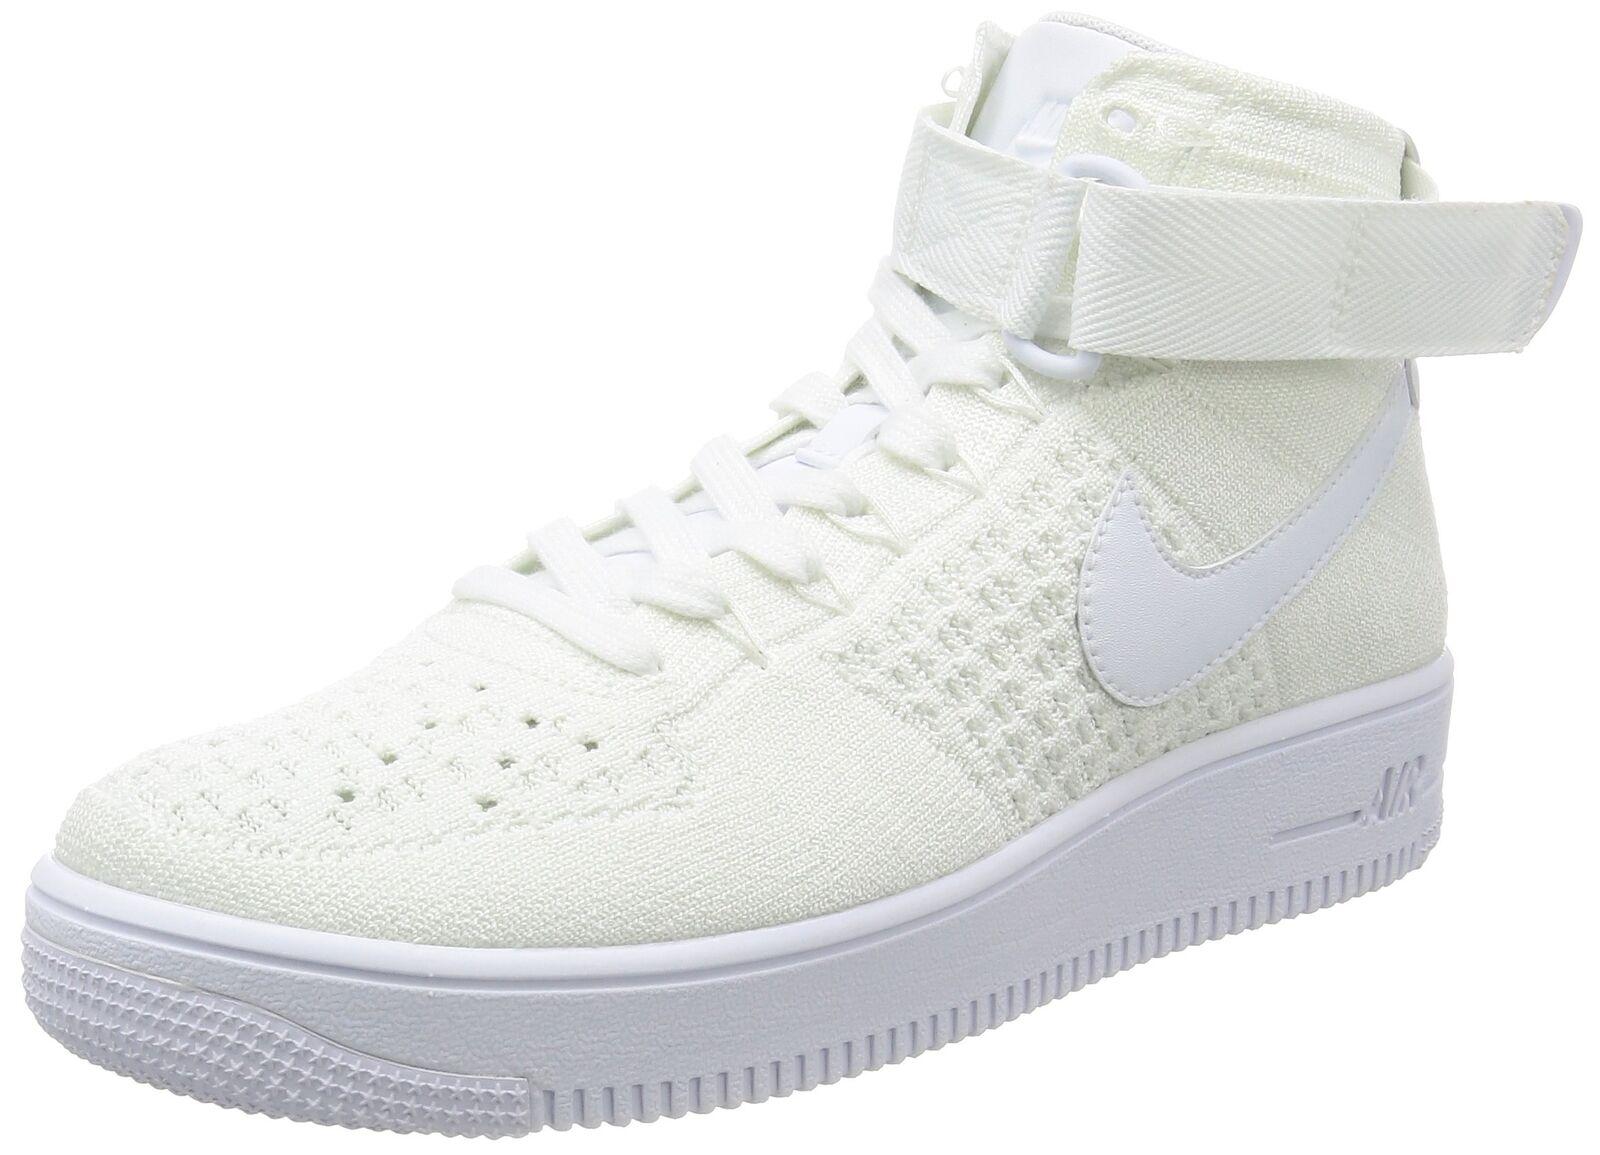 NIKE Men's AF1 Ultra Flyknit Mid Basketball Shoe White/White 10 D(M) US